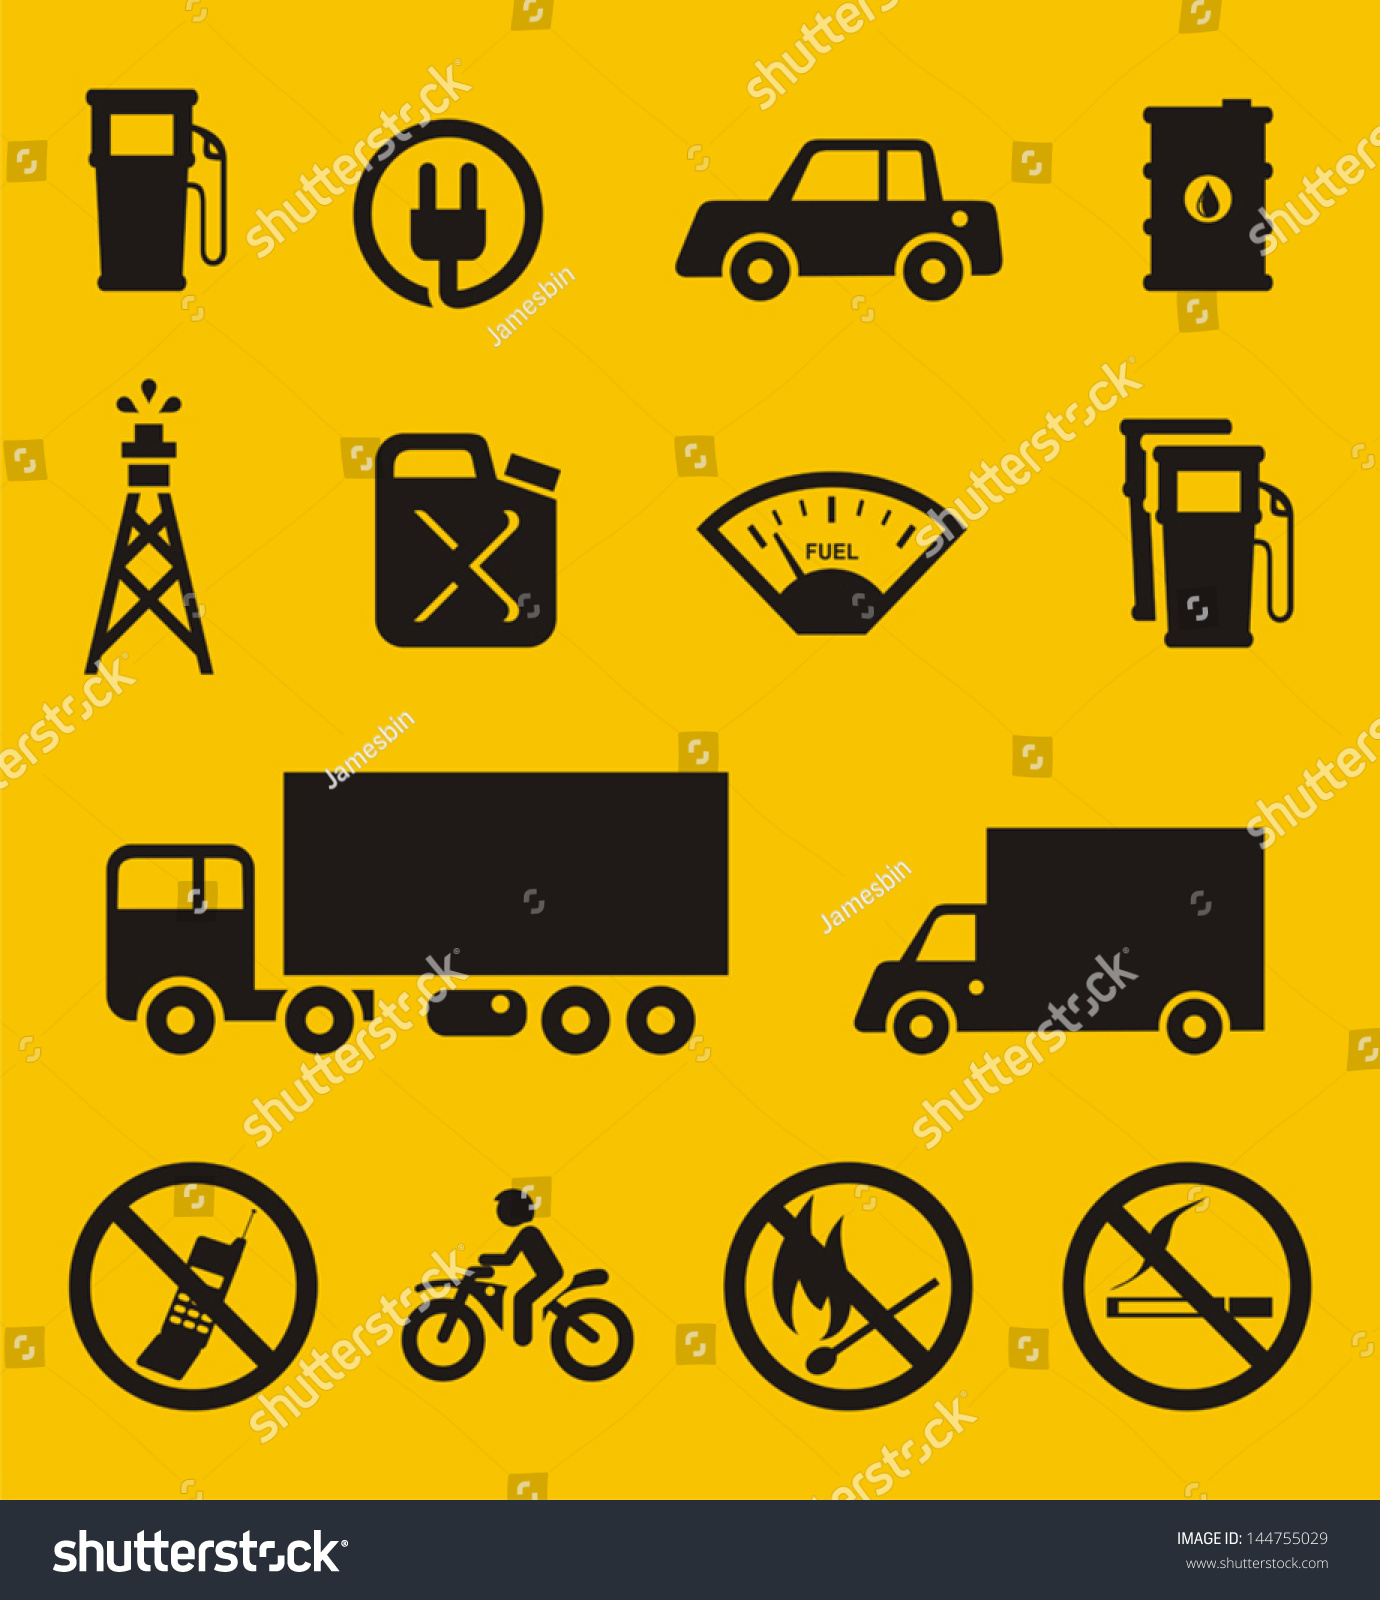 Gas Station Symbols Stock Vector Royalty Free 144755029 Shutterstock